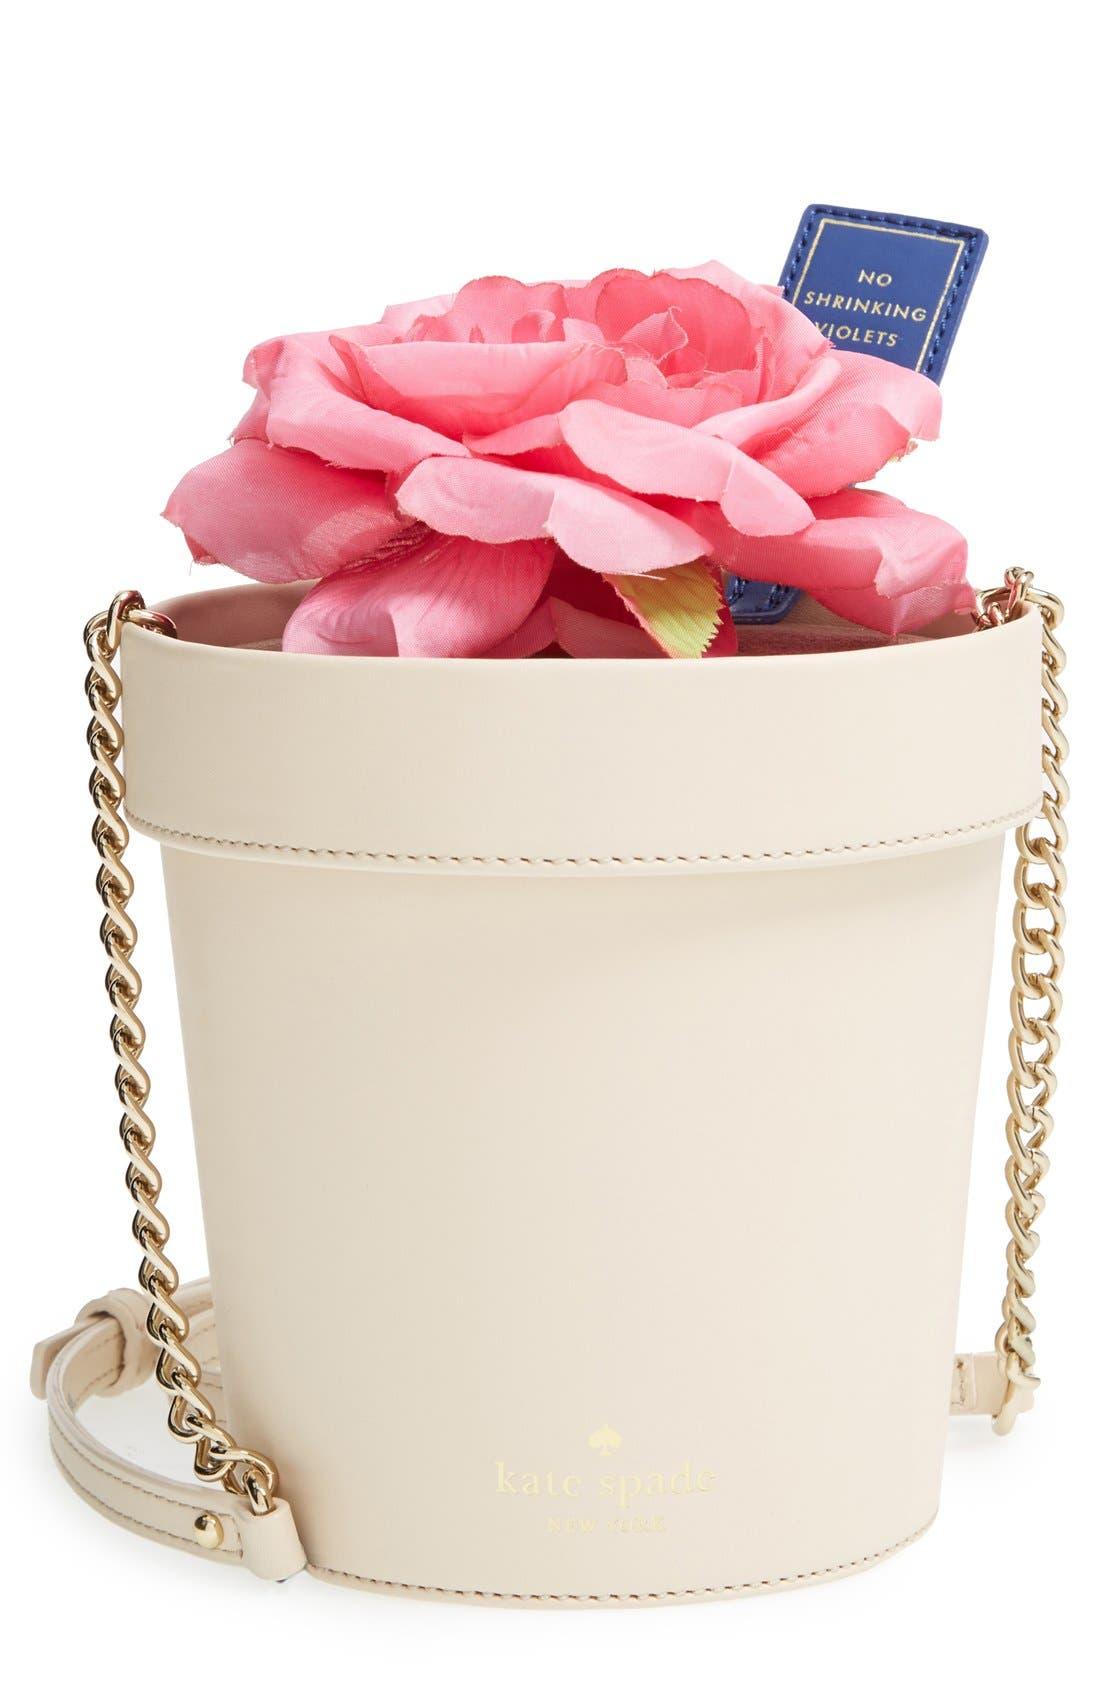 Alternate Image 1 Selected - kate spade new york 'spring forward - flowerpot' crossbody bag